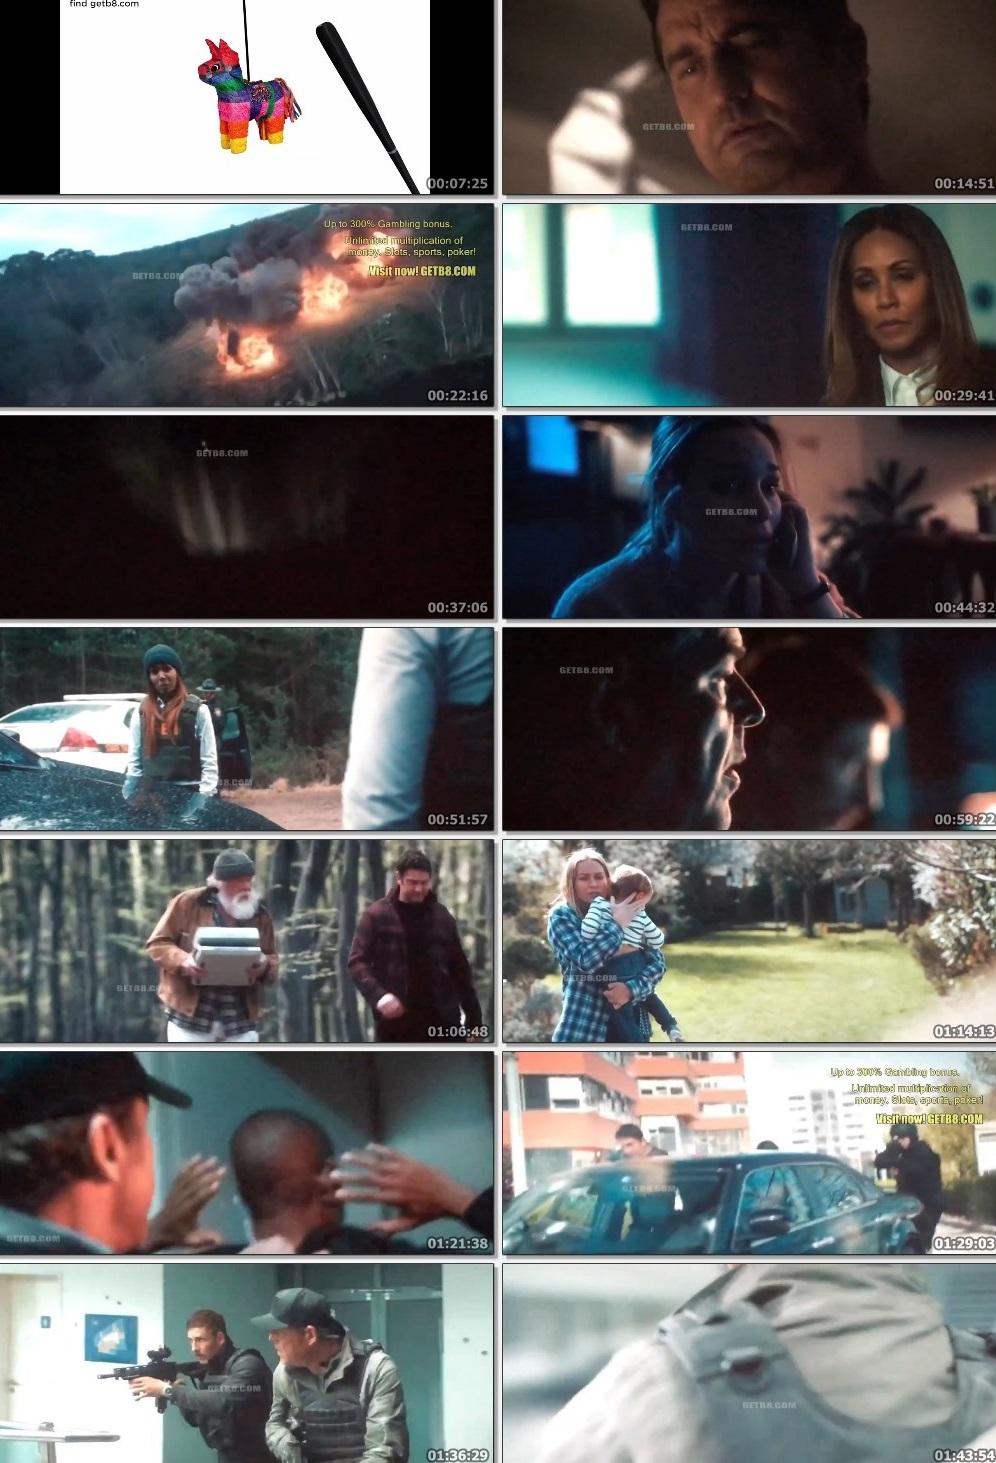 Angel%2BHas%2BFallen%2Bscr Angel Has Fallen 2019 300MB Full Movie WorldFree4u Hindi Dubbed